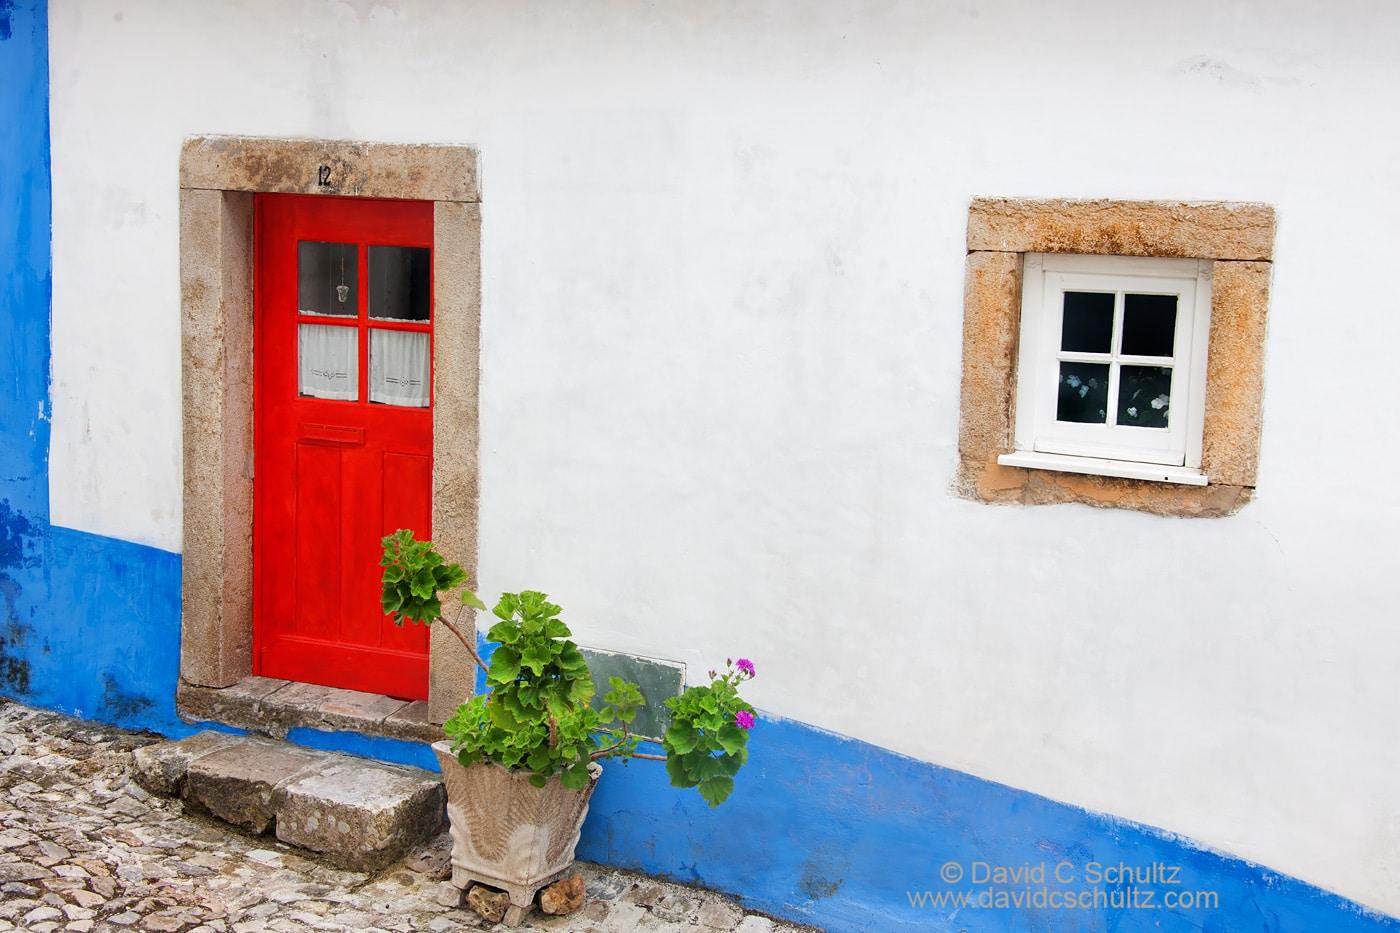 Obidos, Portugal - Image #203-338